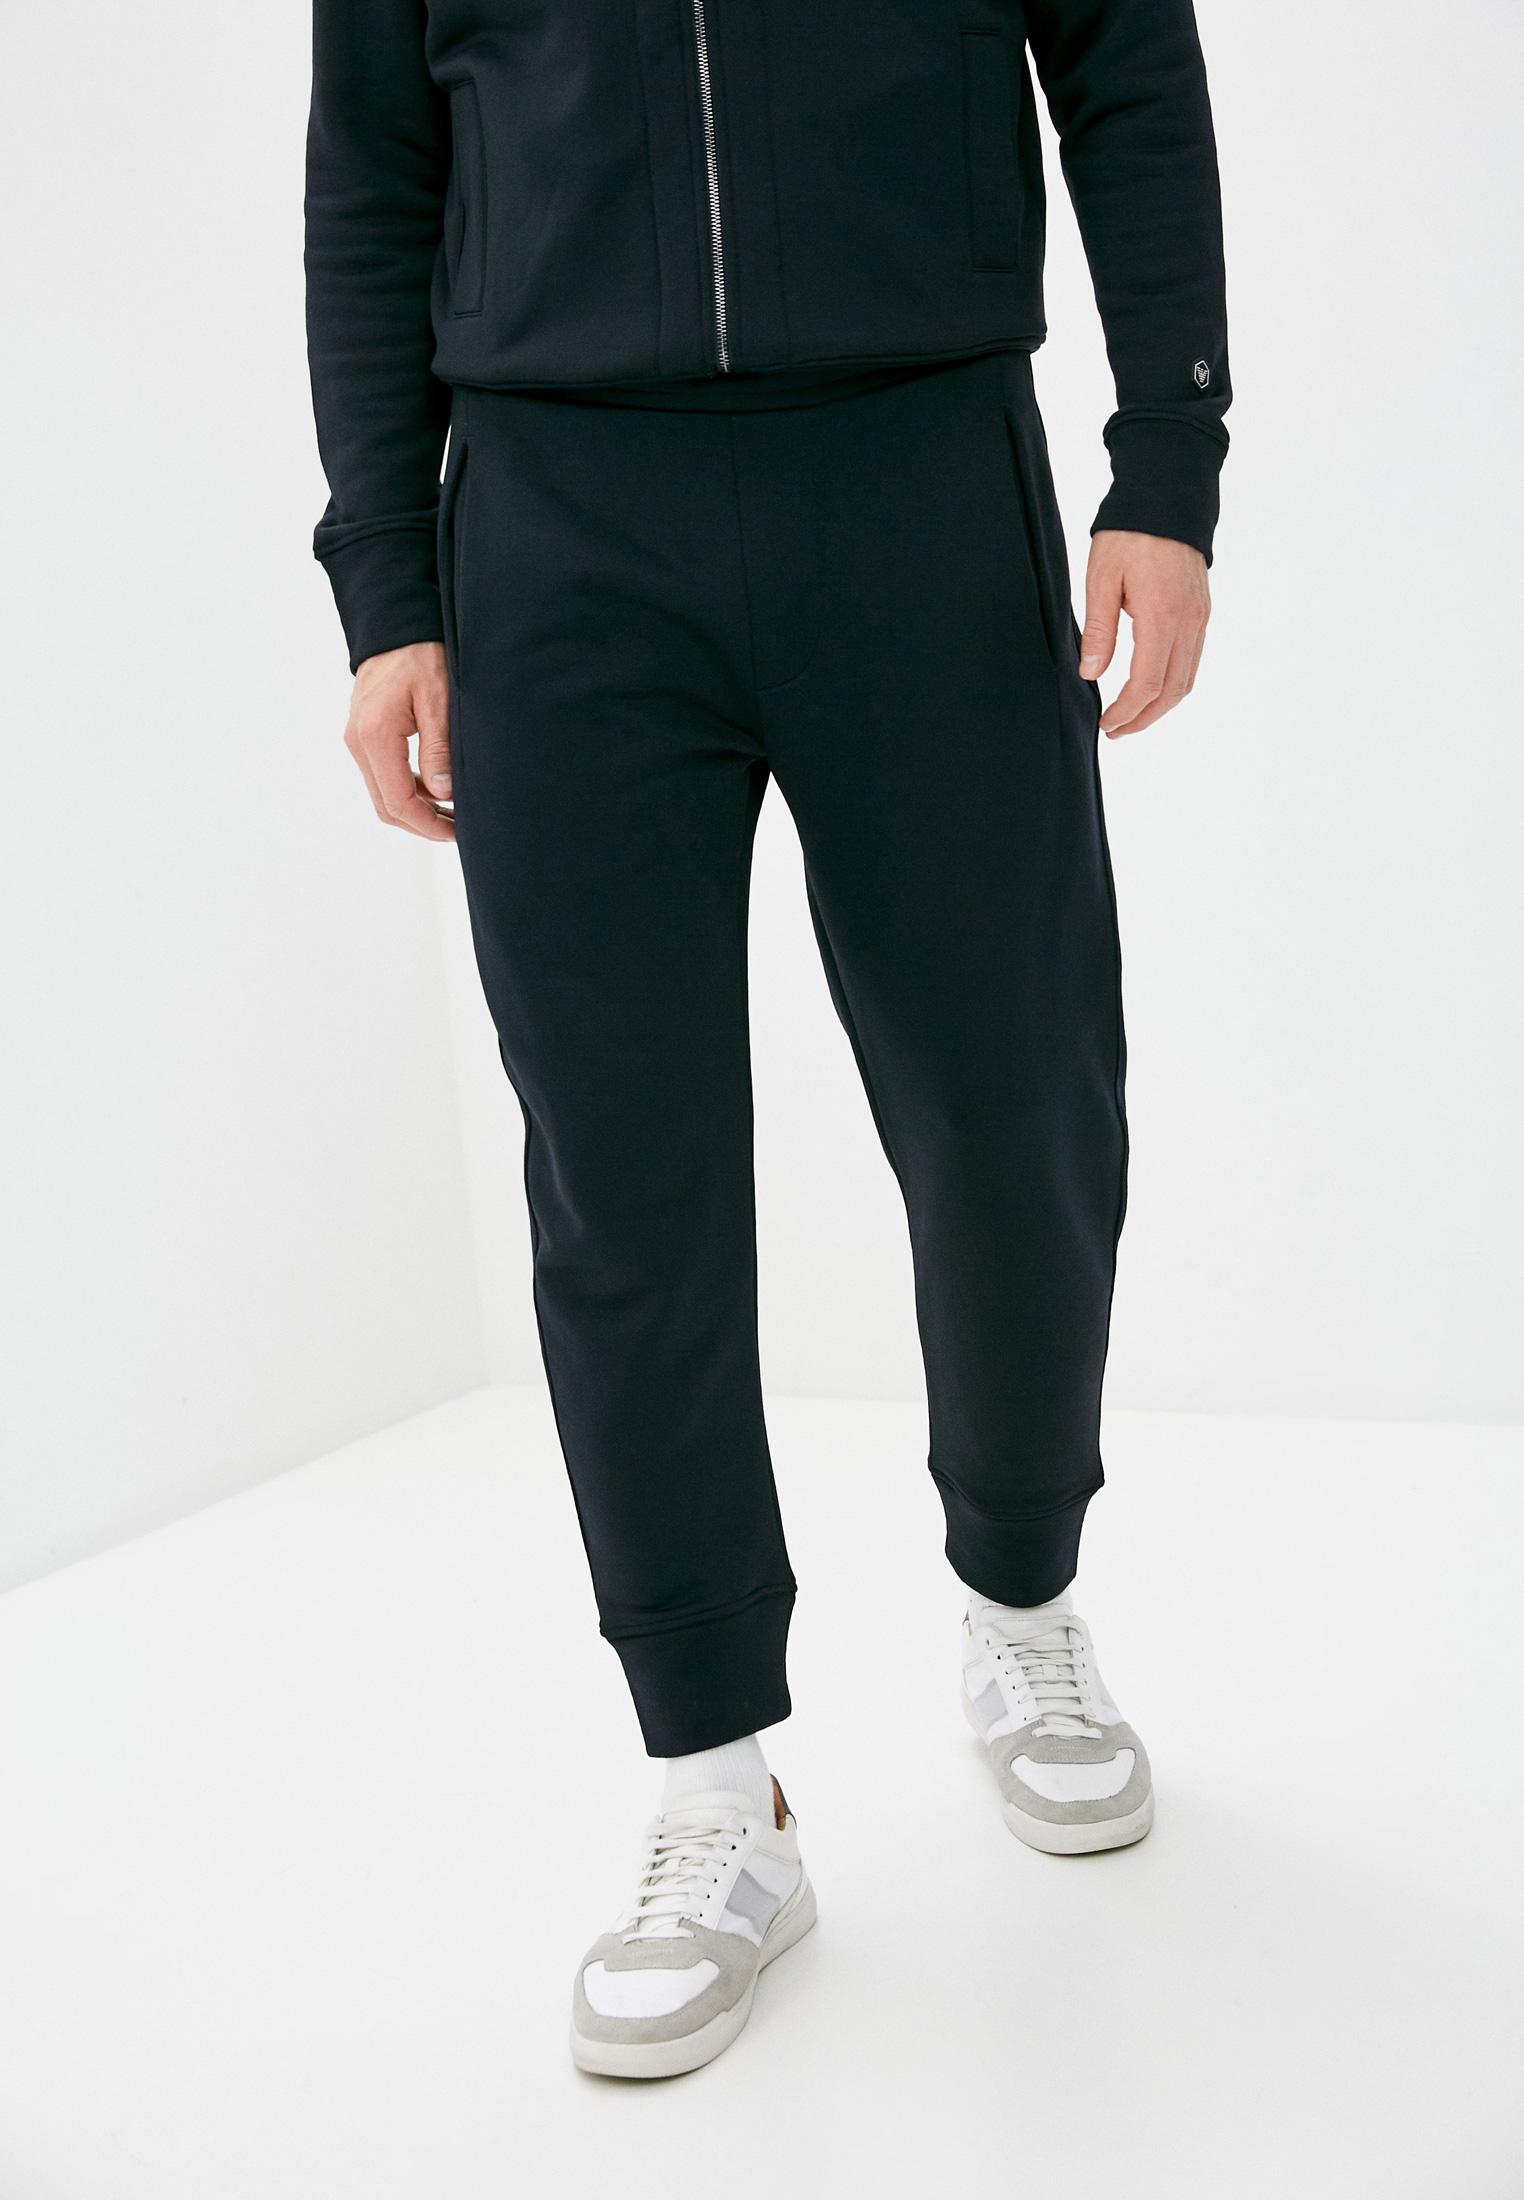 Мужские спортивные брюки Emporio Armani (Эмпорио Армани) 3K1P501JQLZ